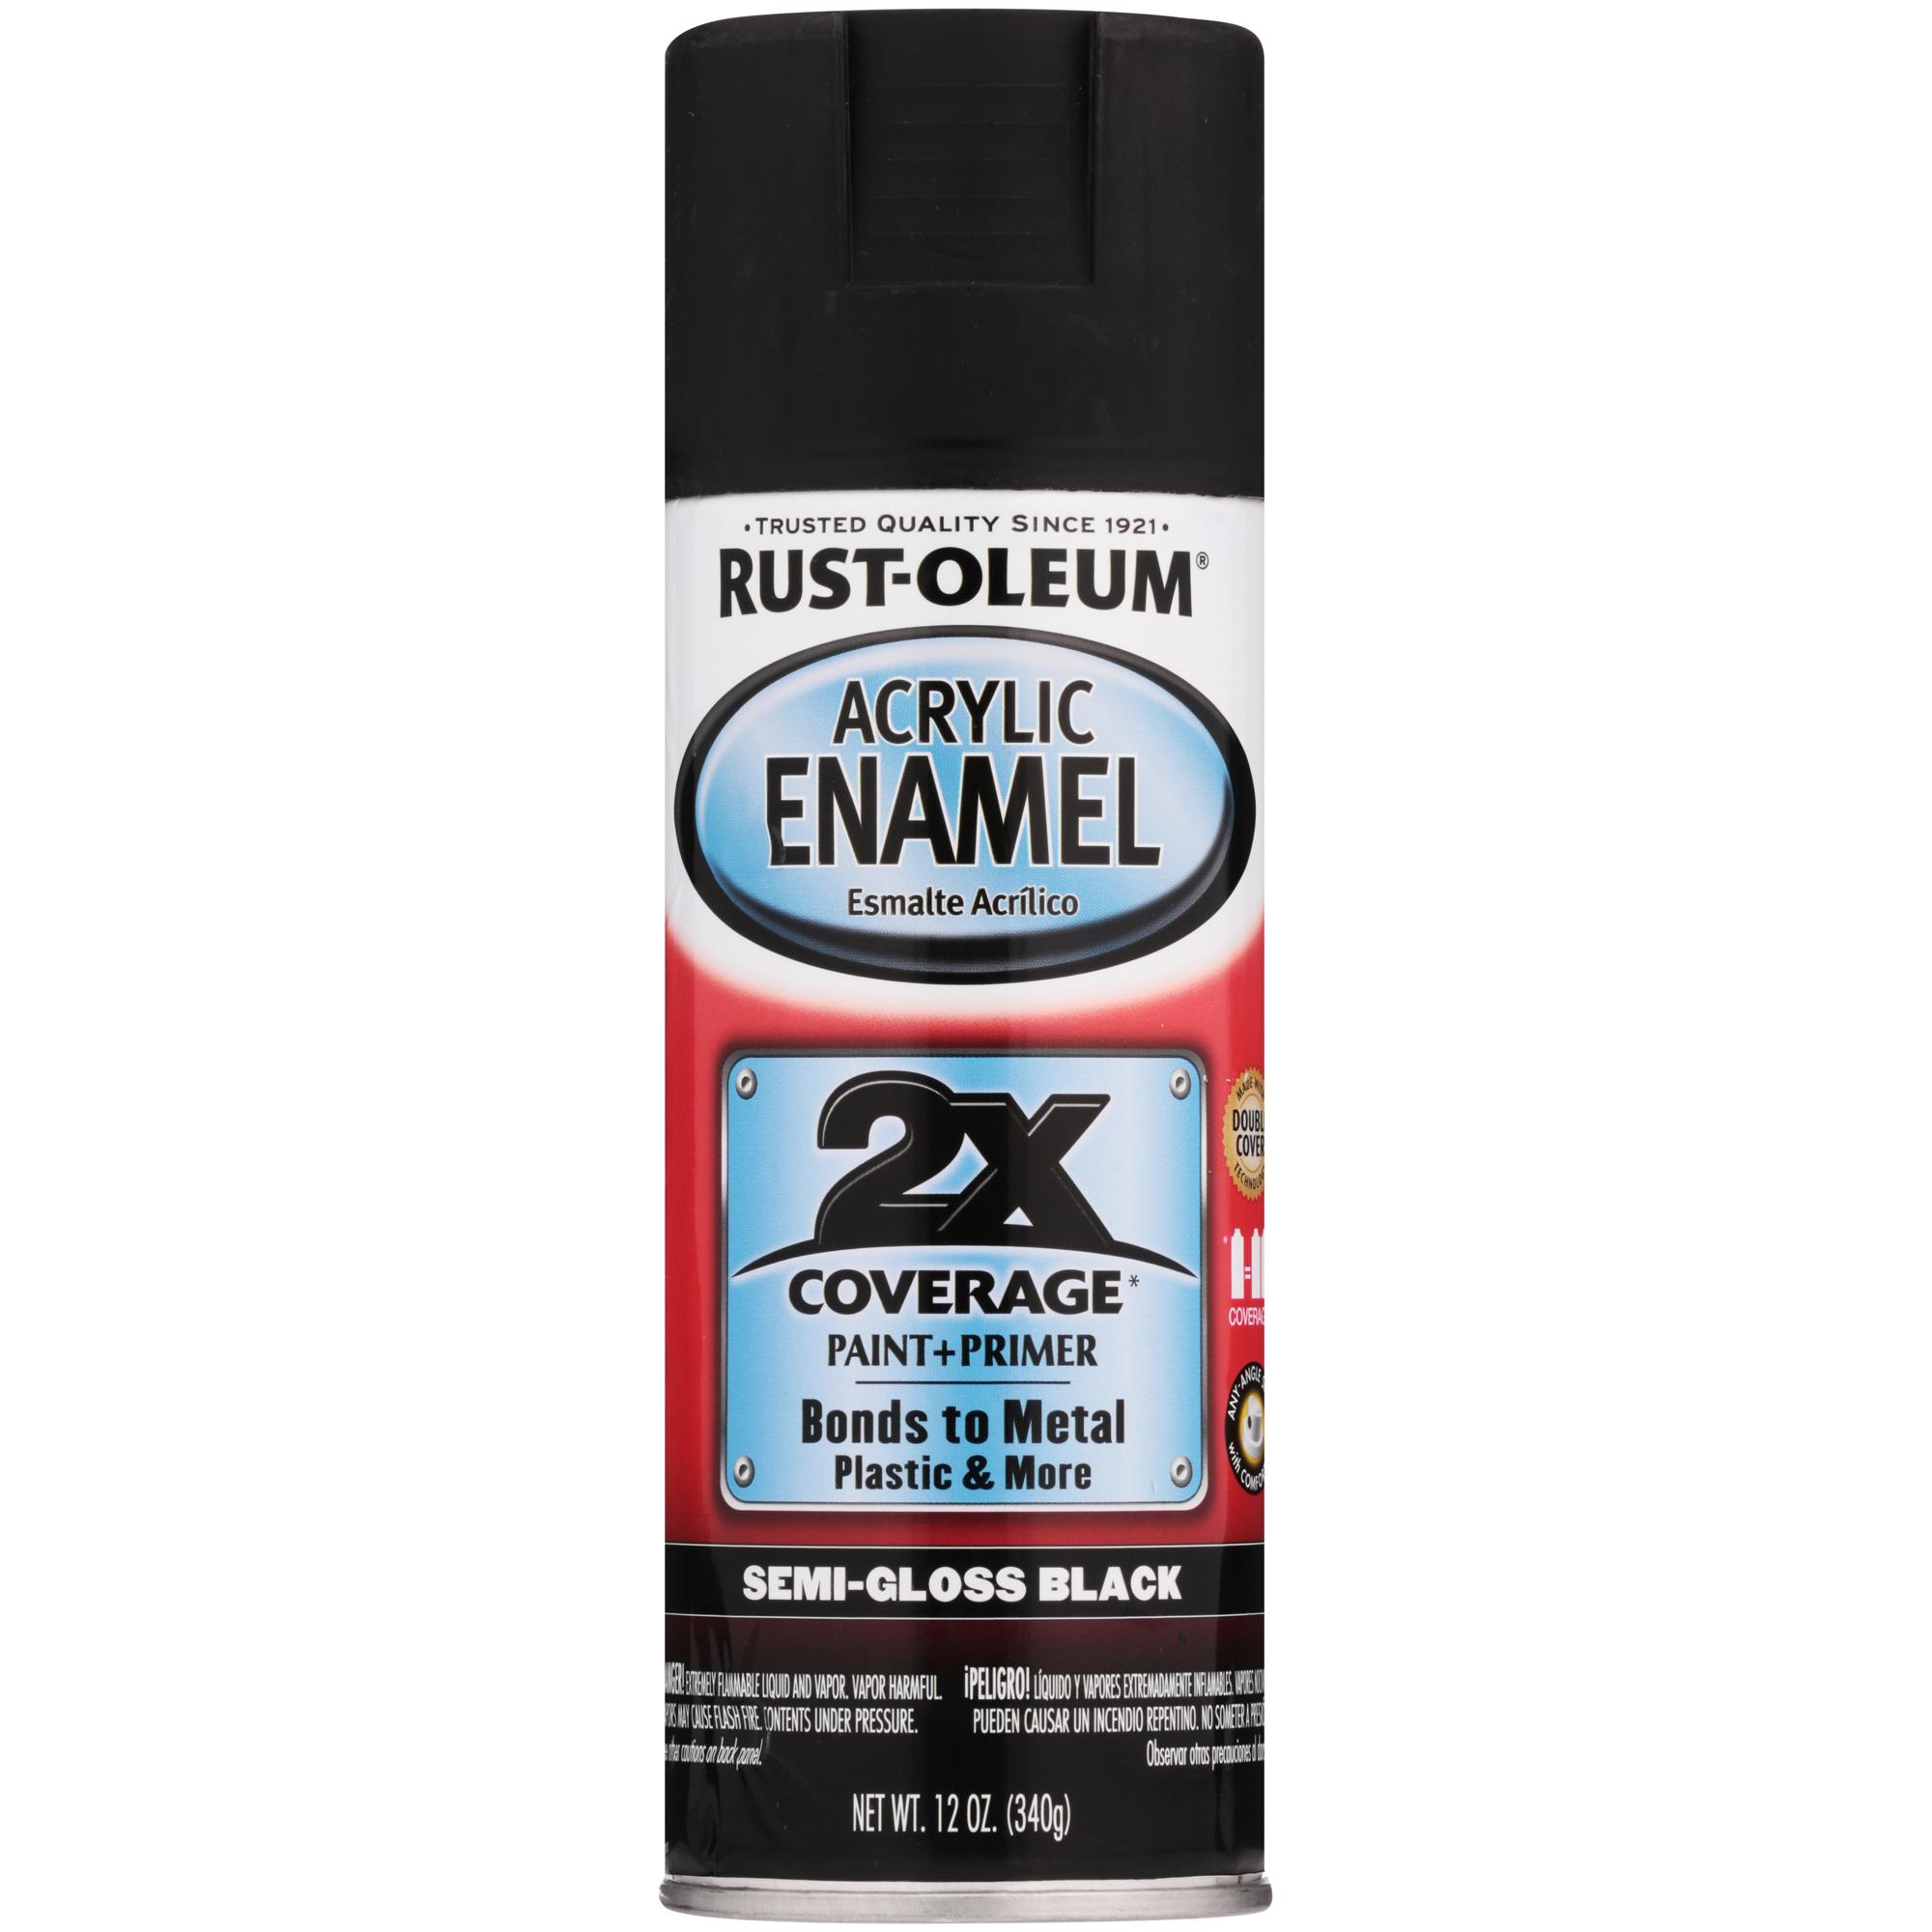 Rust-Oleum® Acrylic Enamel Semi-Gloss Black Spray Paint + Primer 12 oz. Can